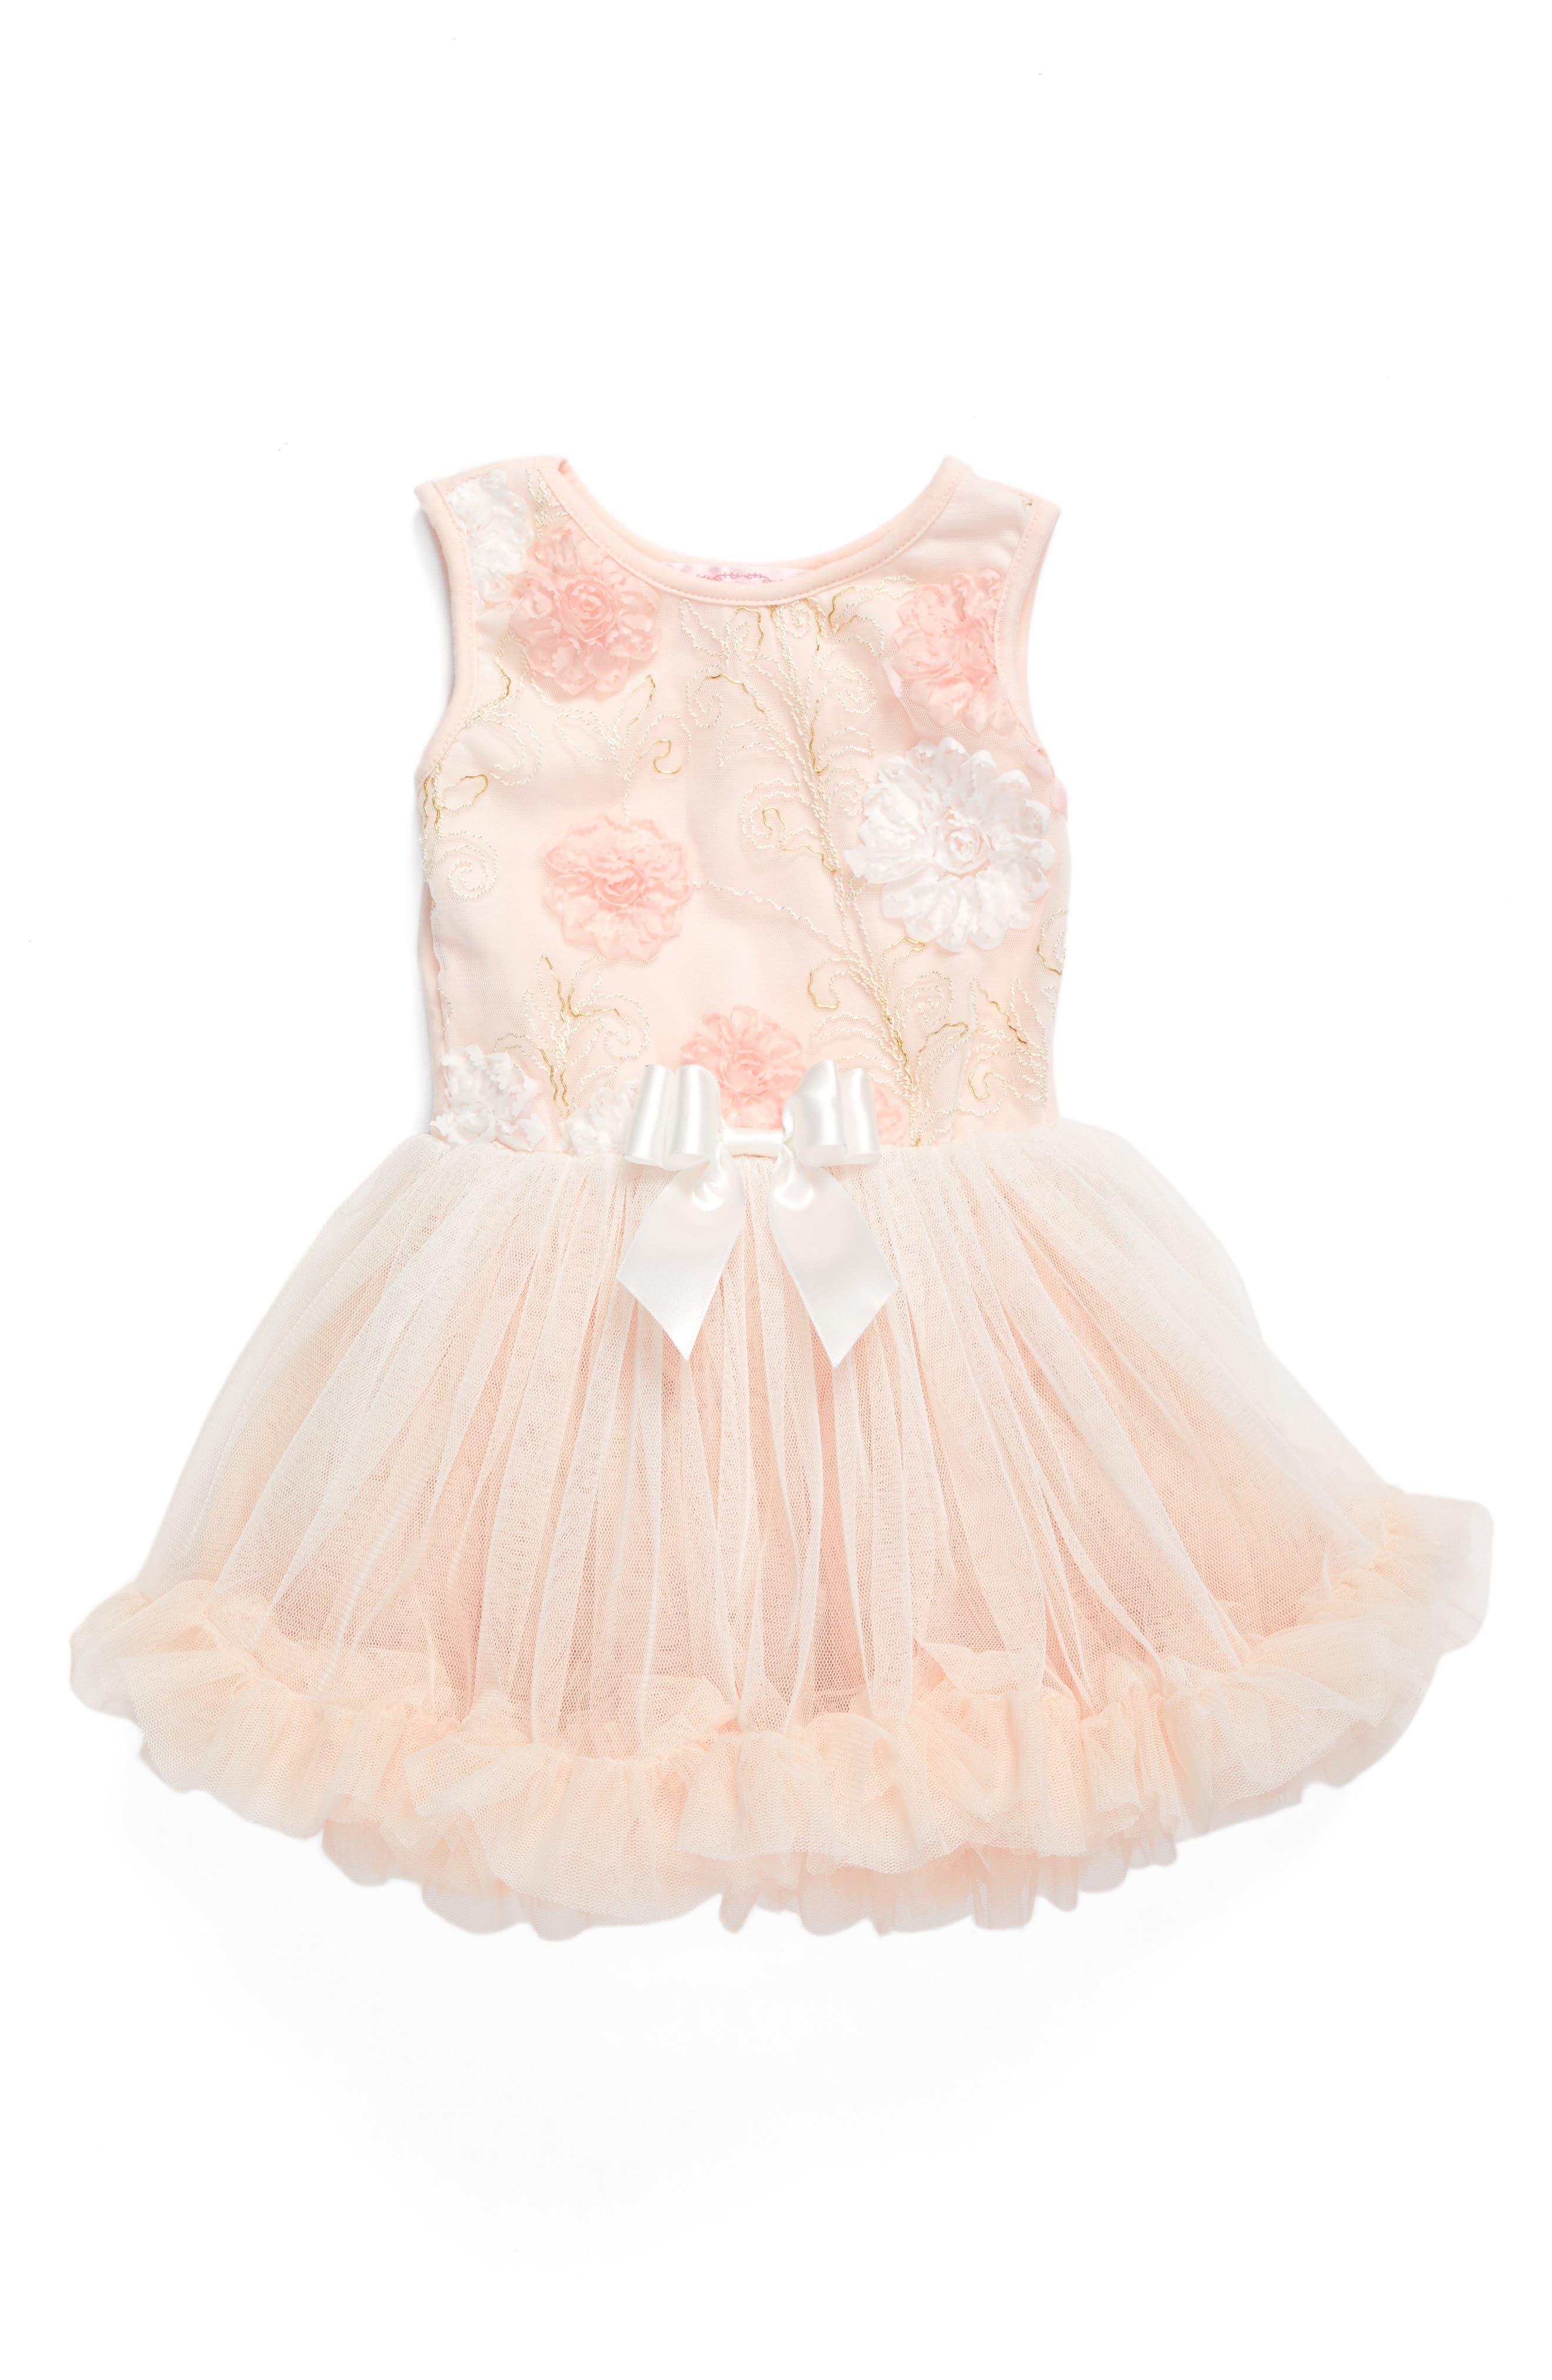 Peach Elegant Flower Fit & Flare Dress,                             Main thumbnail 1, color,                             950